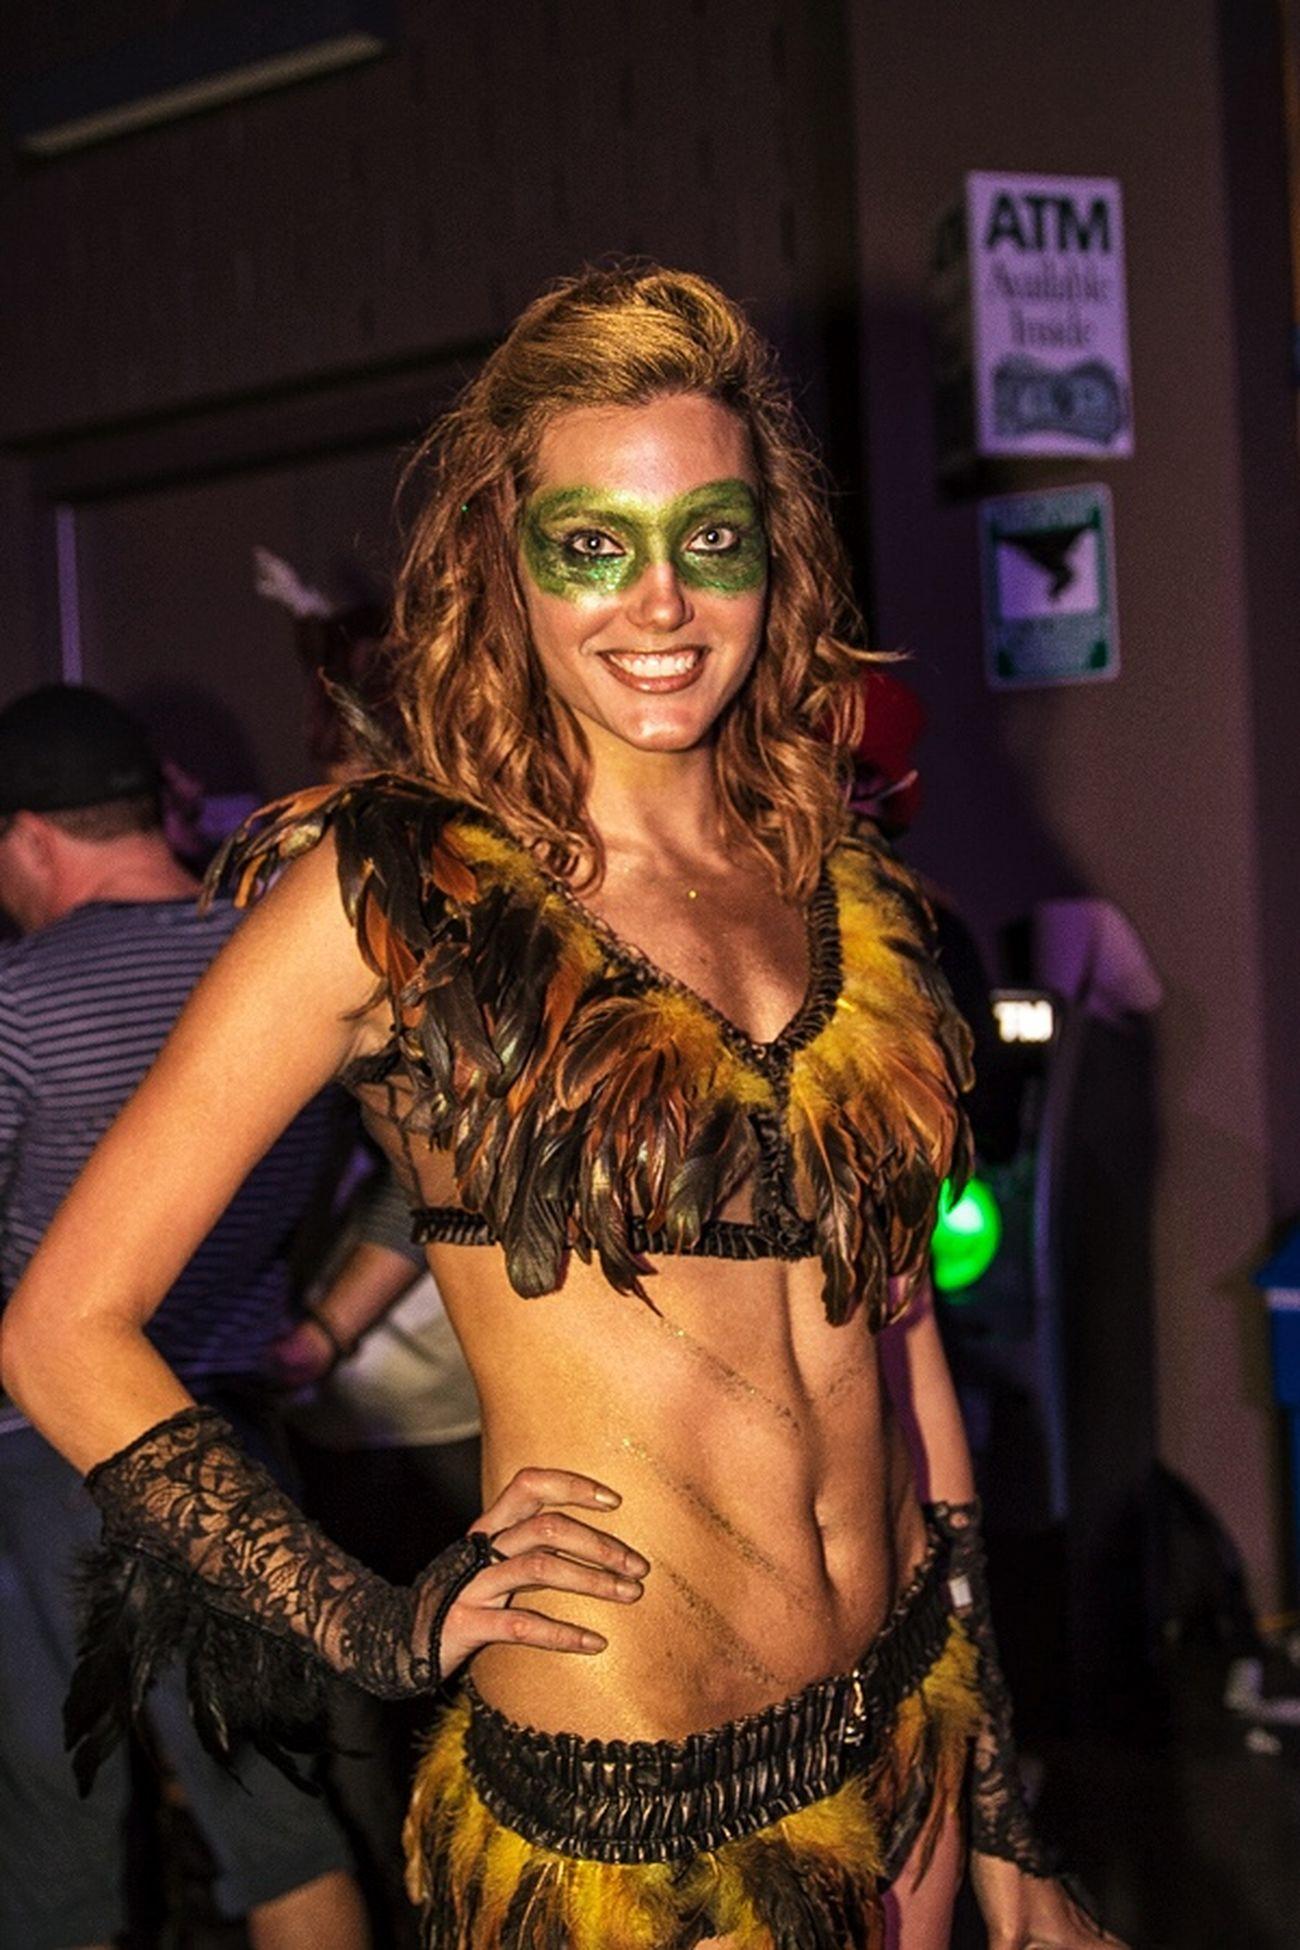 Carnavalbrasileiro Palmereventscenter Costume Austin Texas EyeEmTexas Carnaval2015 Carnavalatx